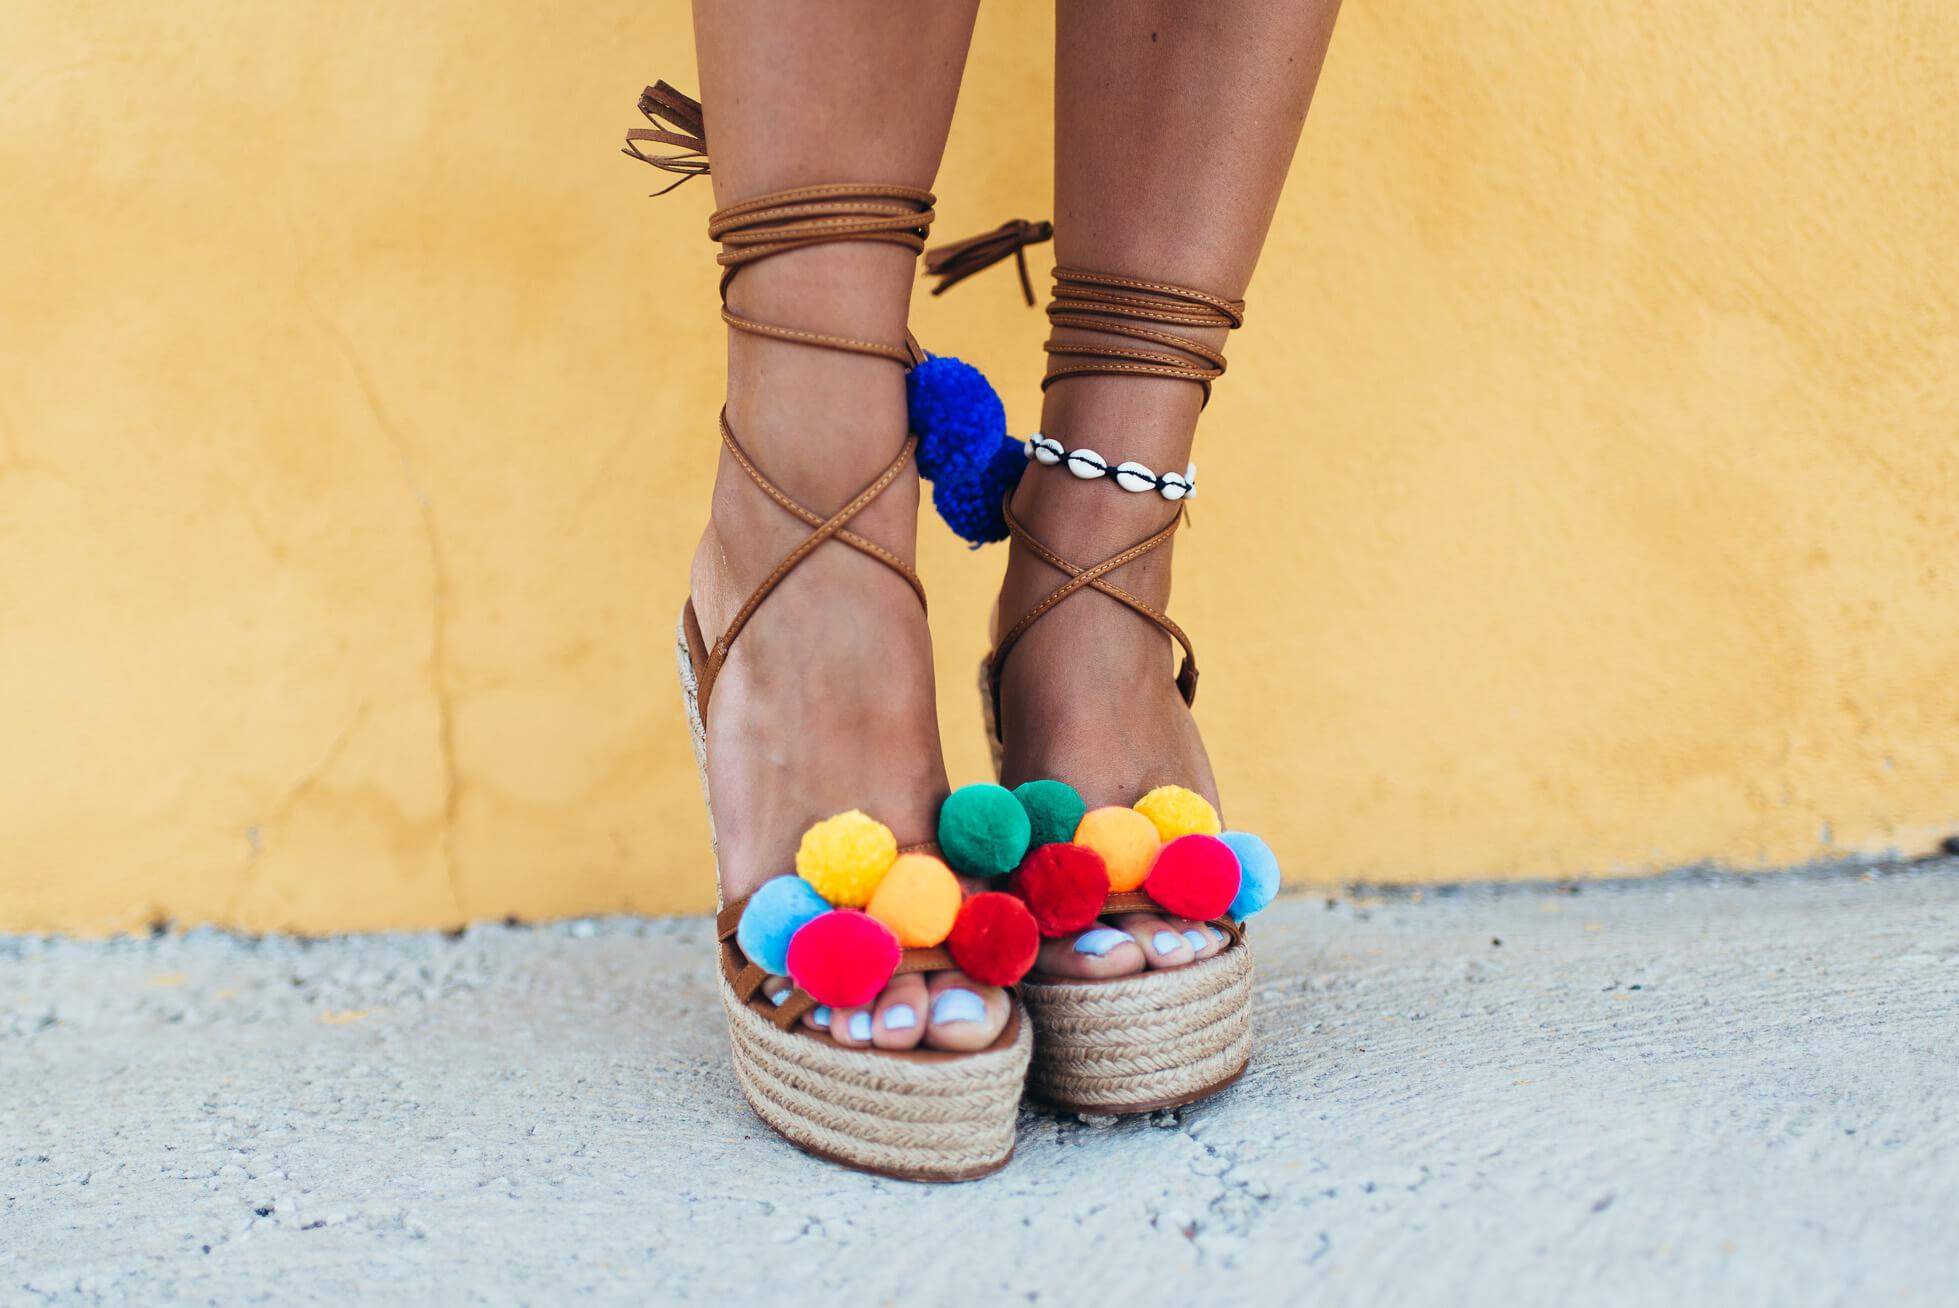 janni-deler-candy-shoesDSC_8025